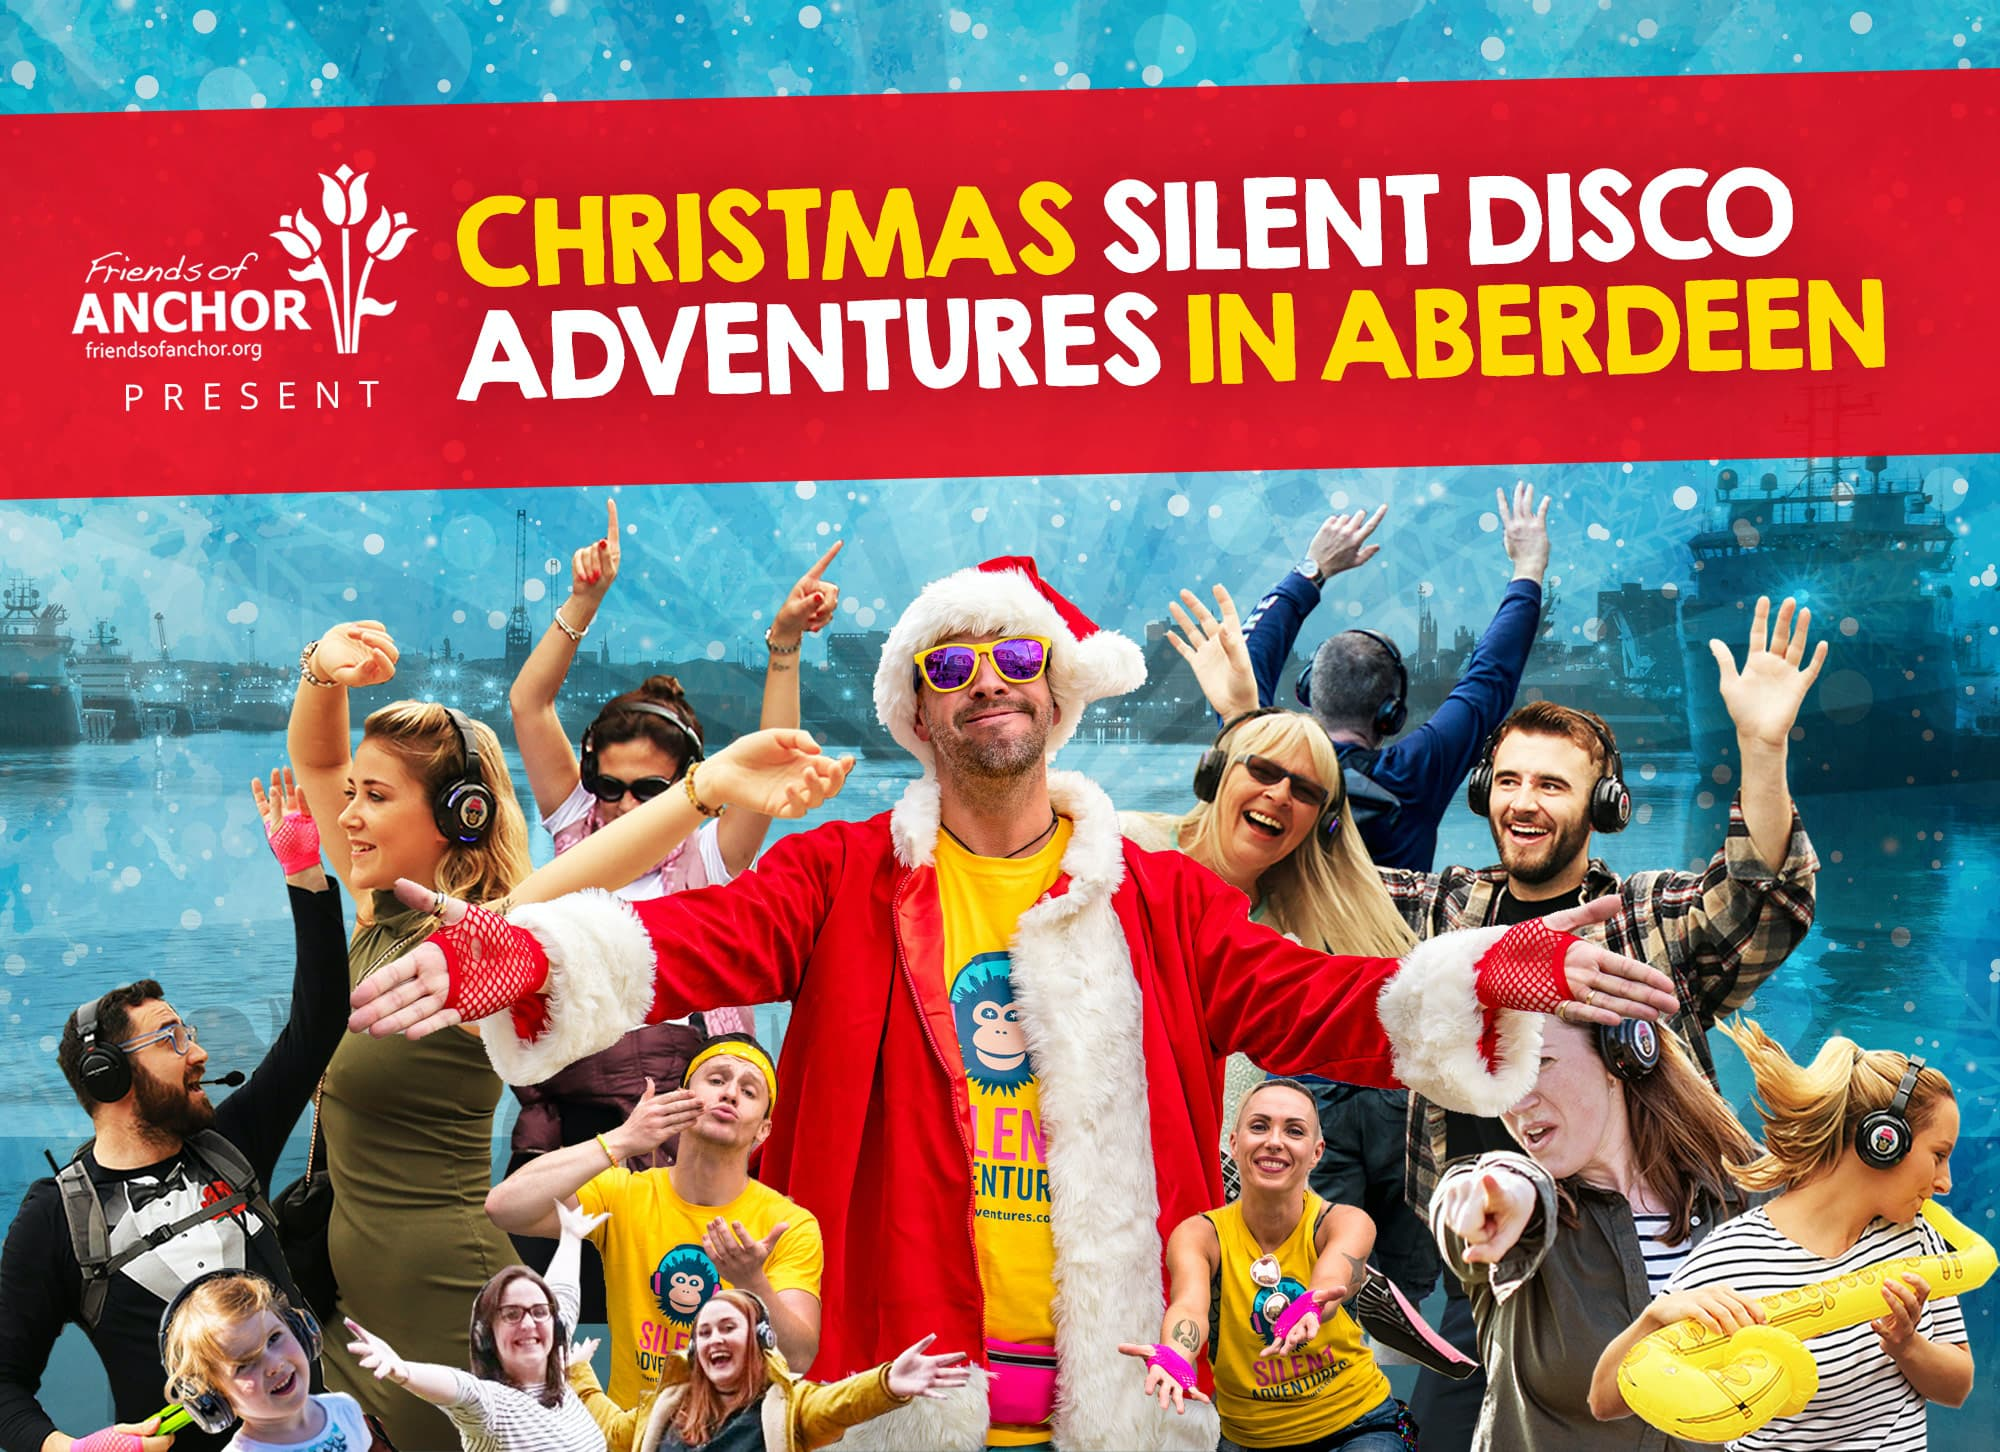 Aberdeen Christmas silent Disco Adventures